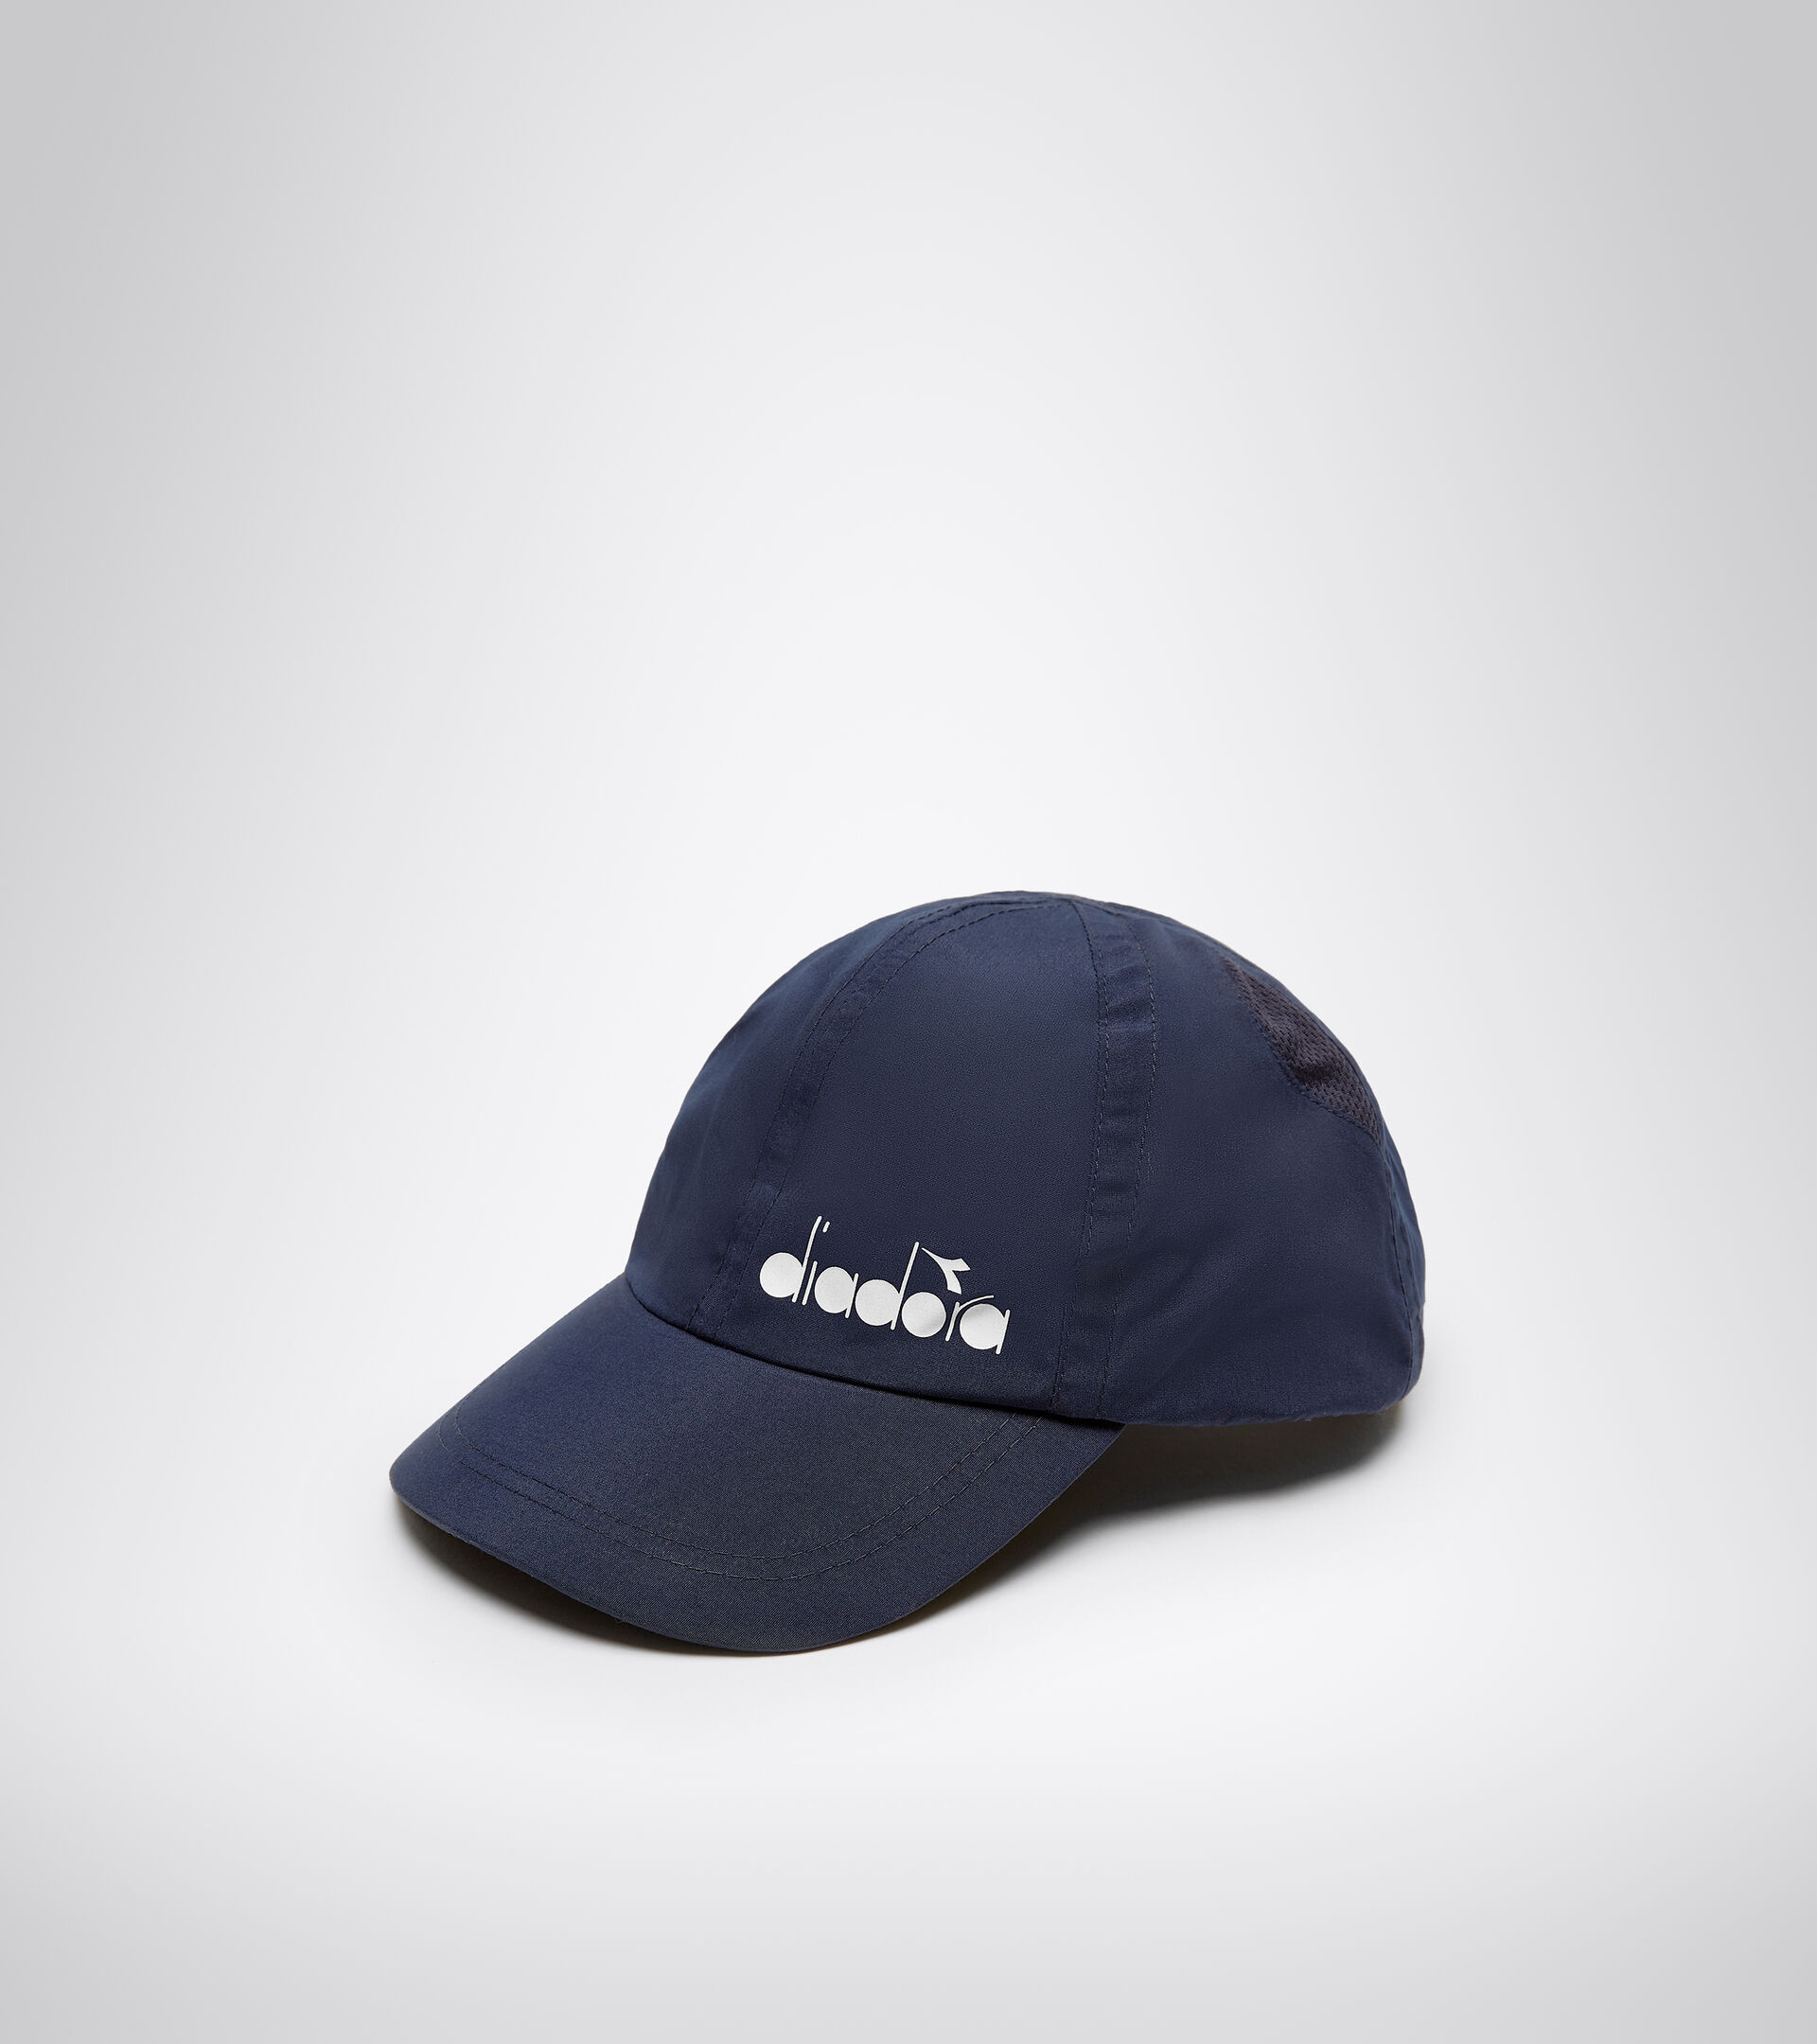 Cappellino con frontino CAP COURT BLU ESTATE - Diadora